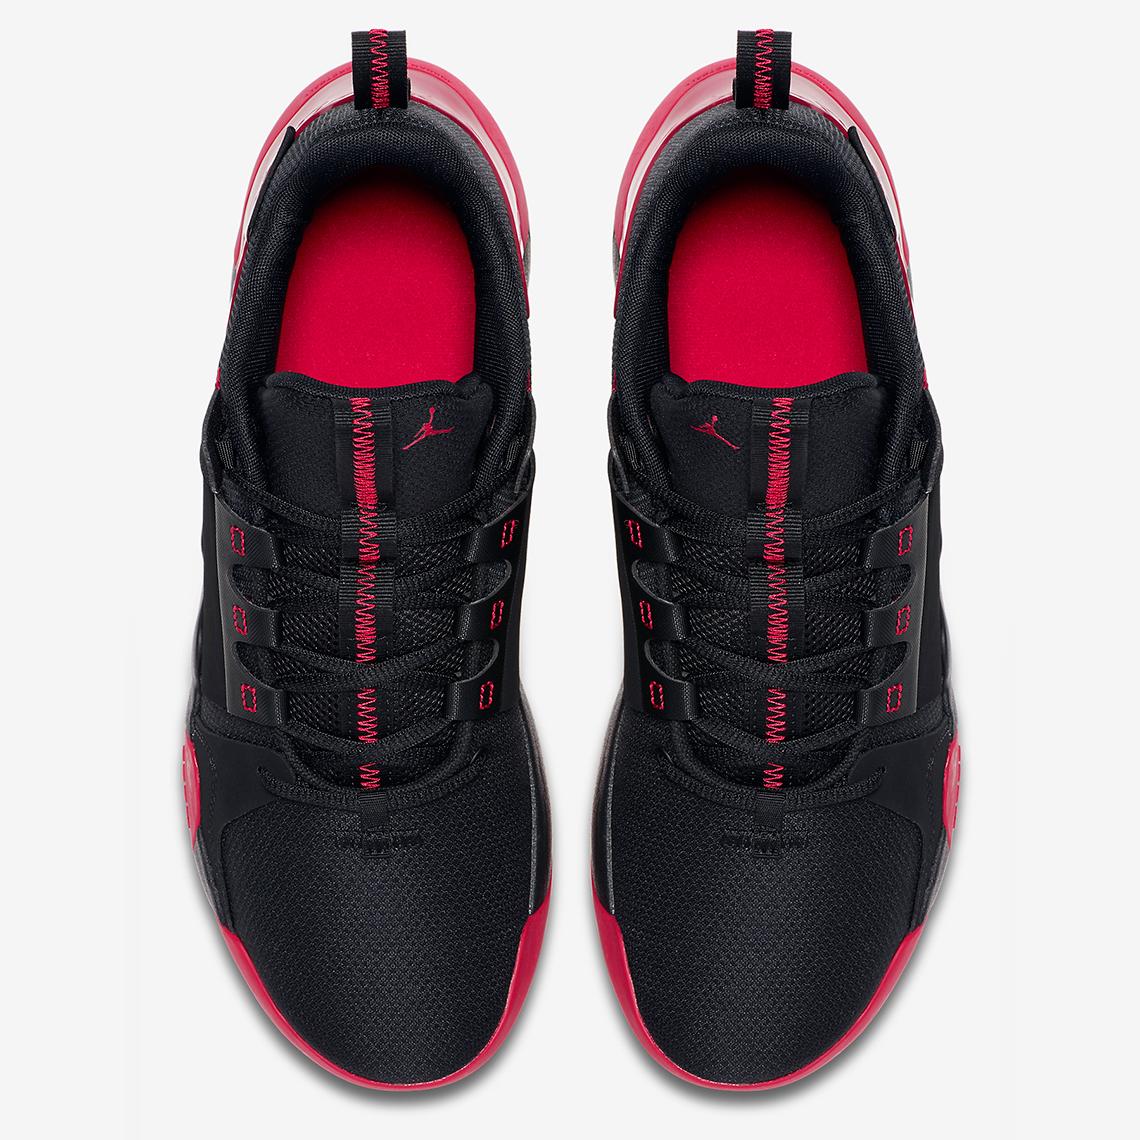 e168a928b23 Jordan Zero Gravity Bred AO9027-006 Release Info   SneakerNews.com